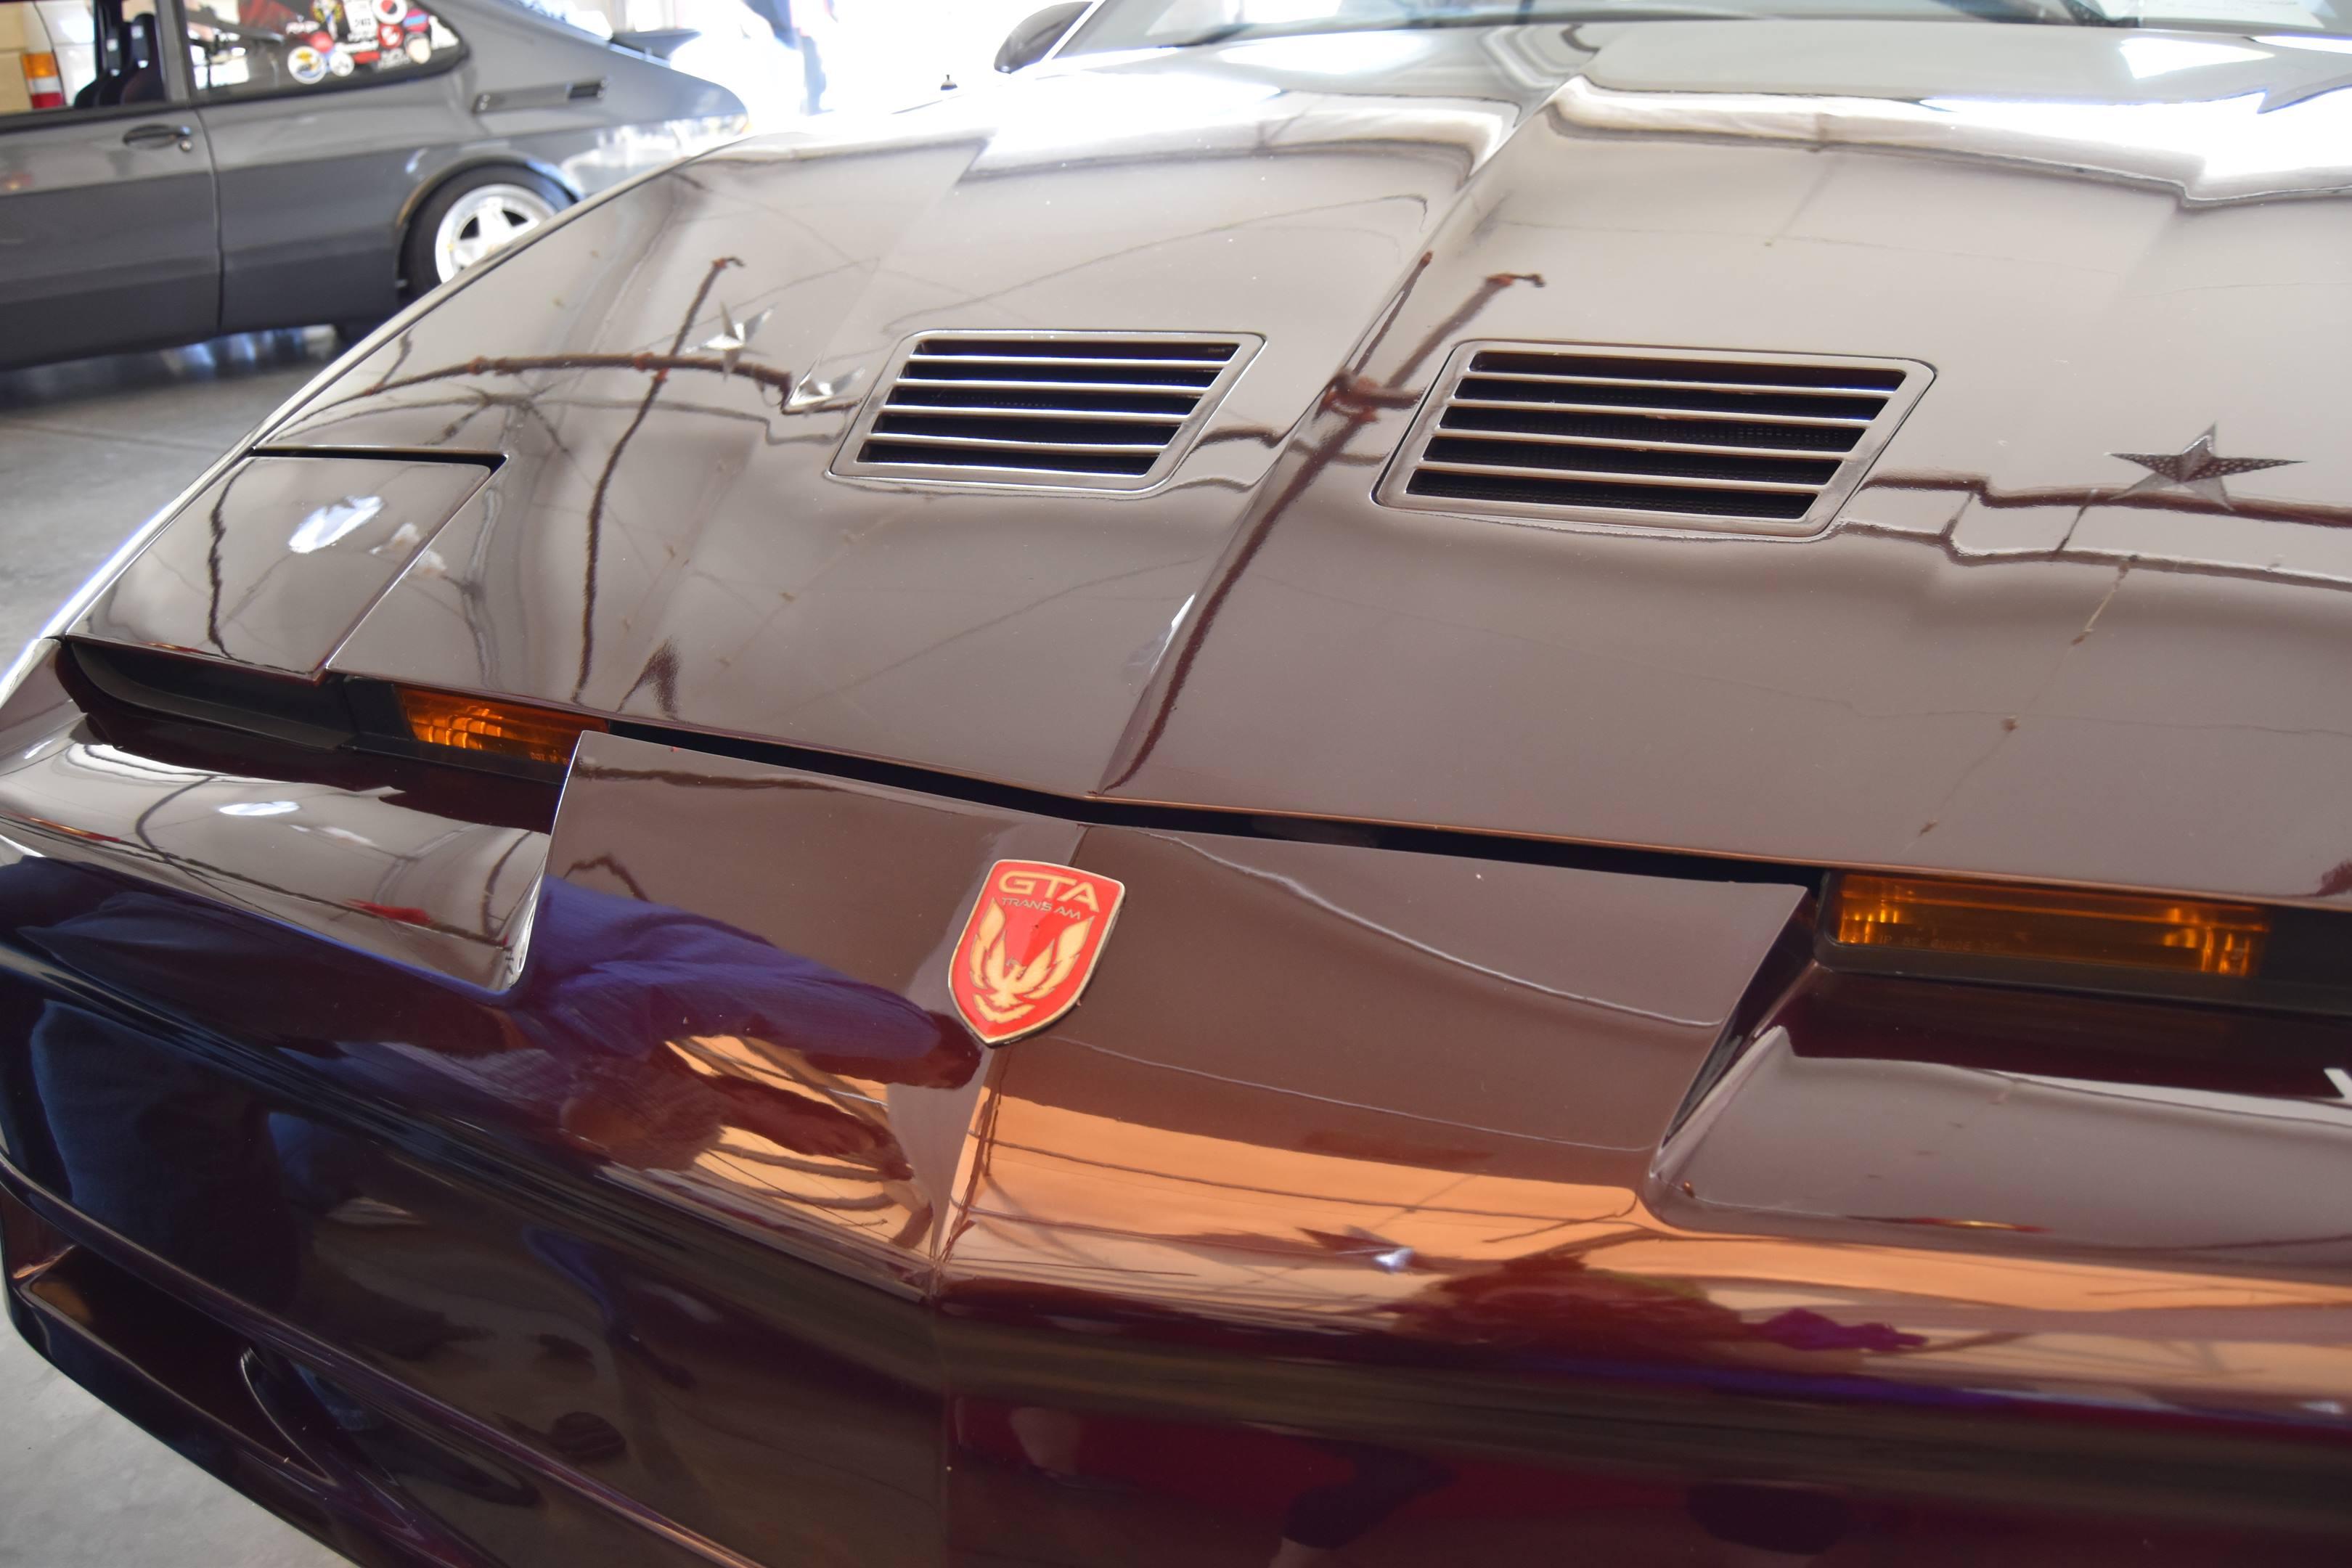 Pontiac Trans Am GTA badge